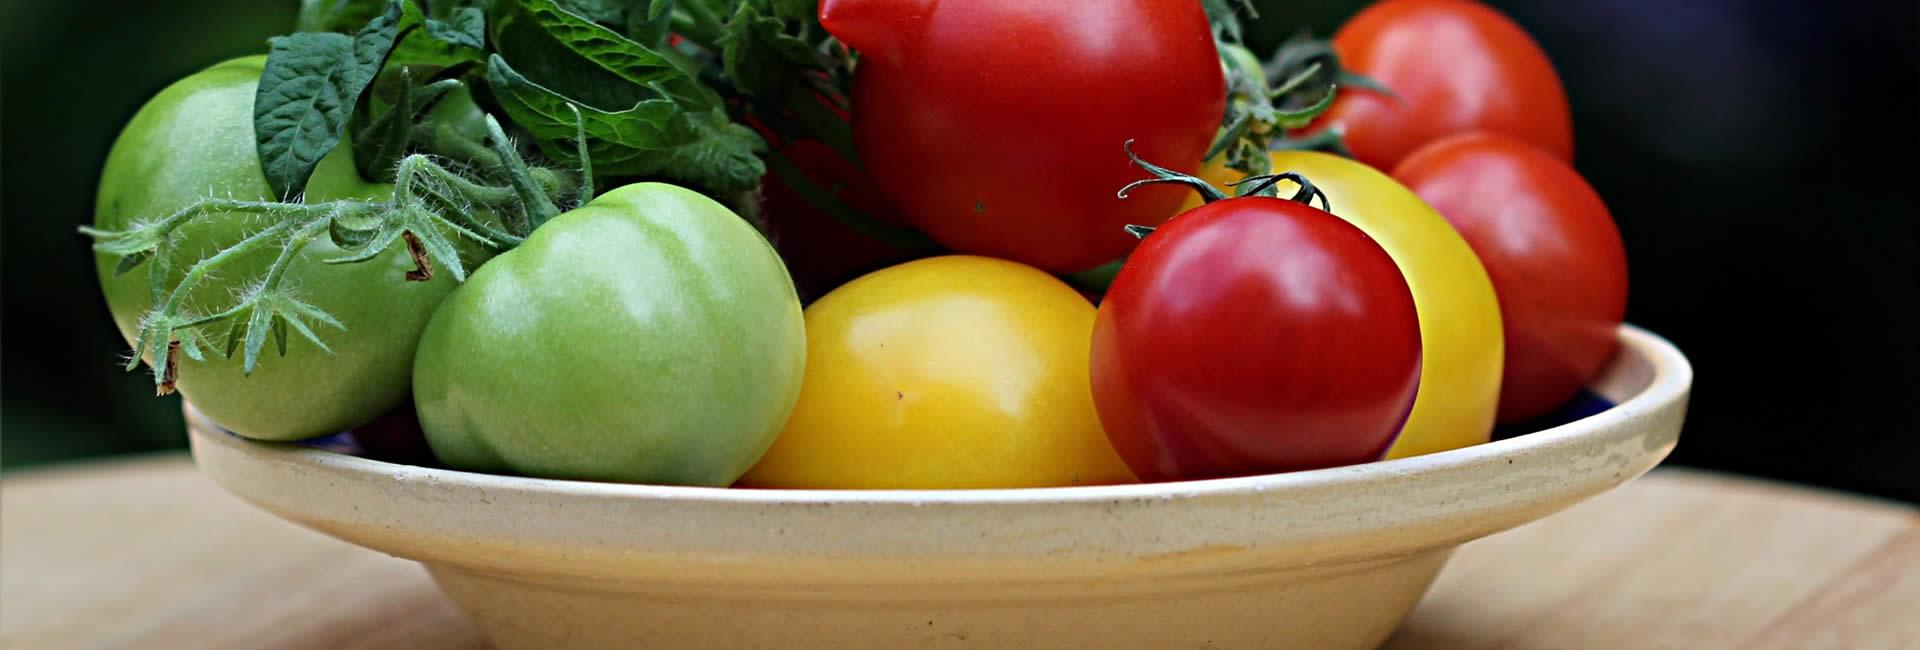 dietologi cremona - verdura